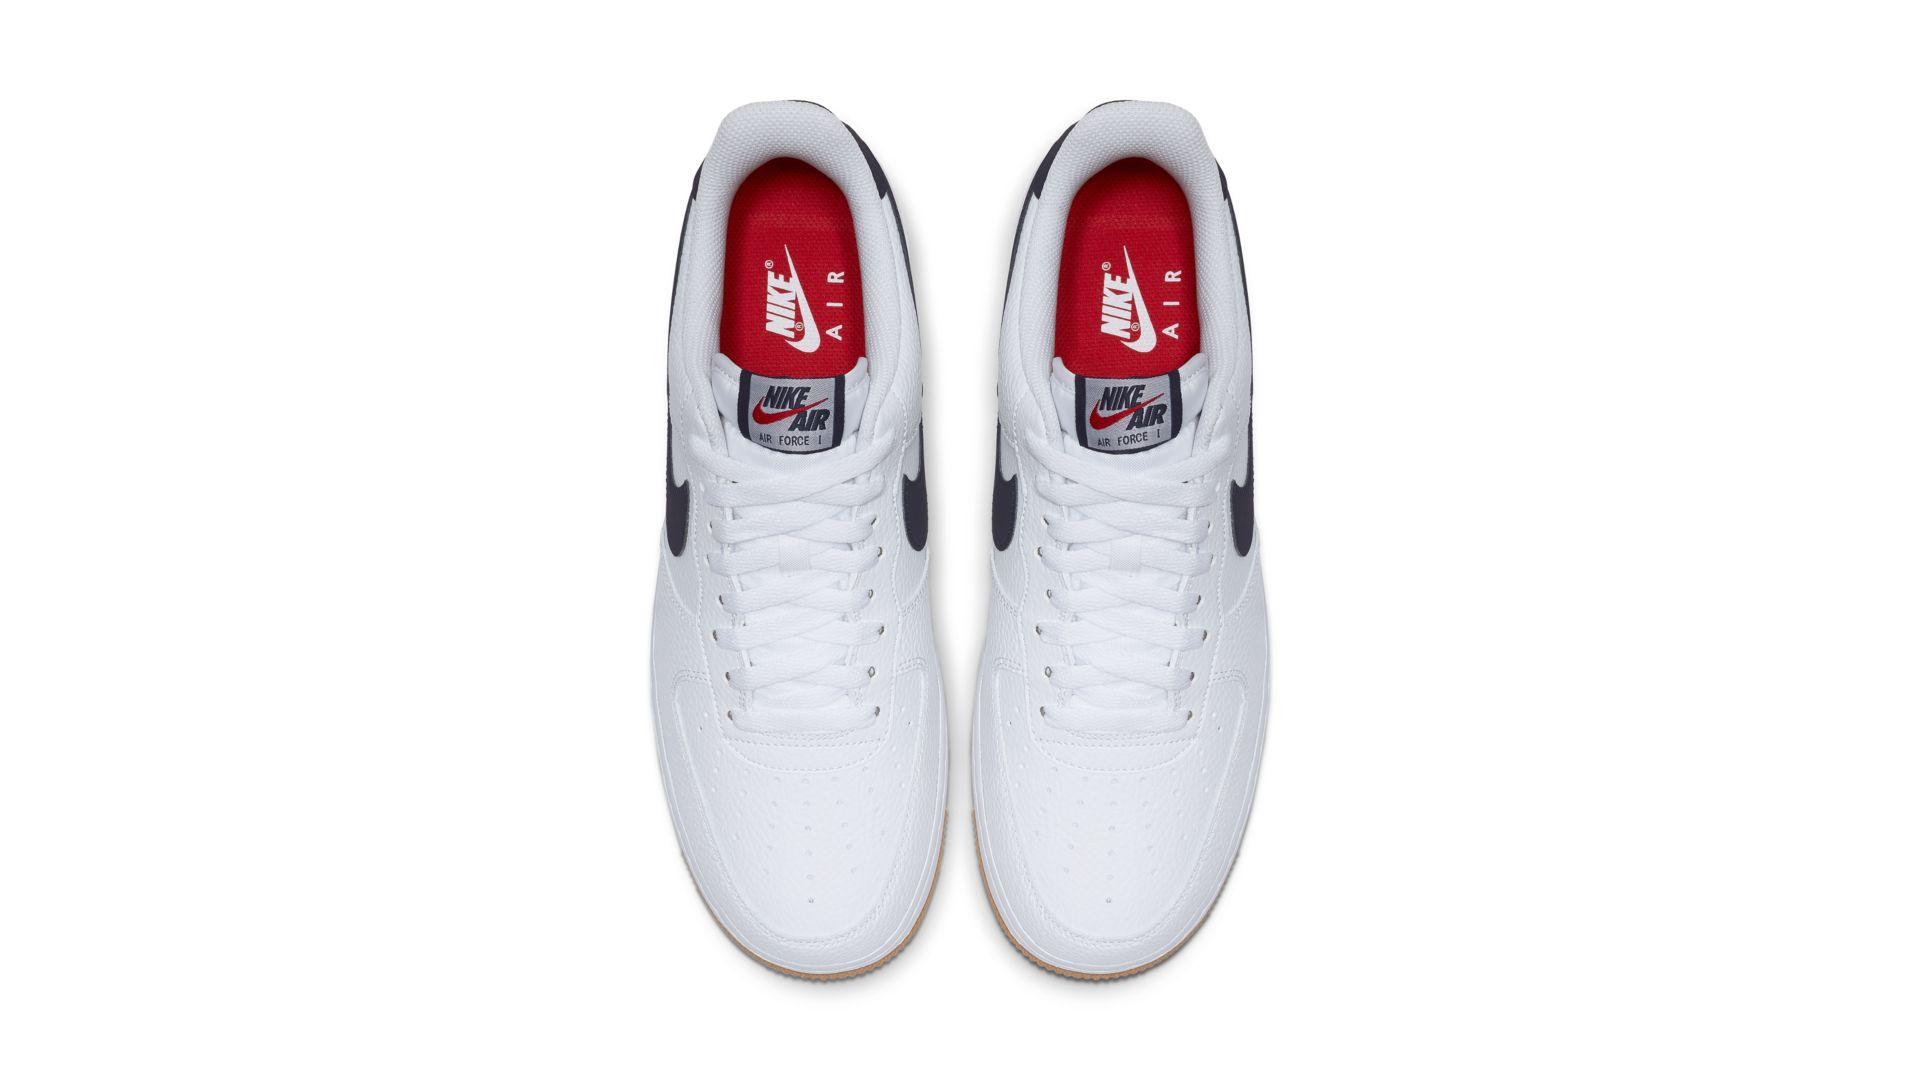 Nike Air Force 1 Low '07 White Obsidian (CI0057-100)